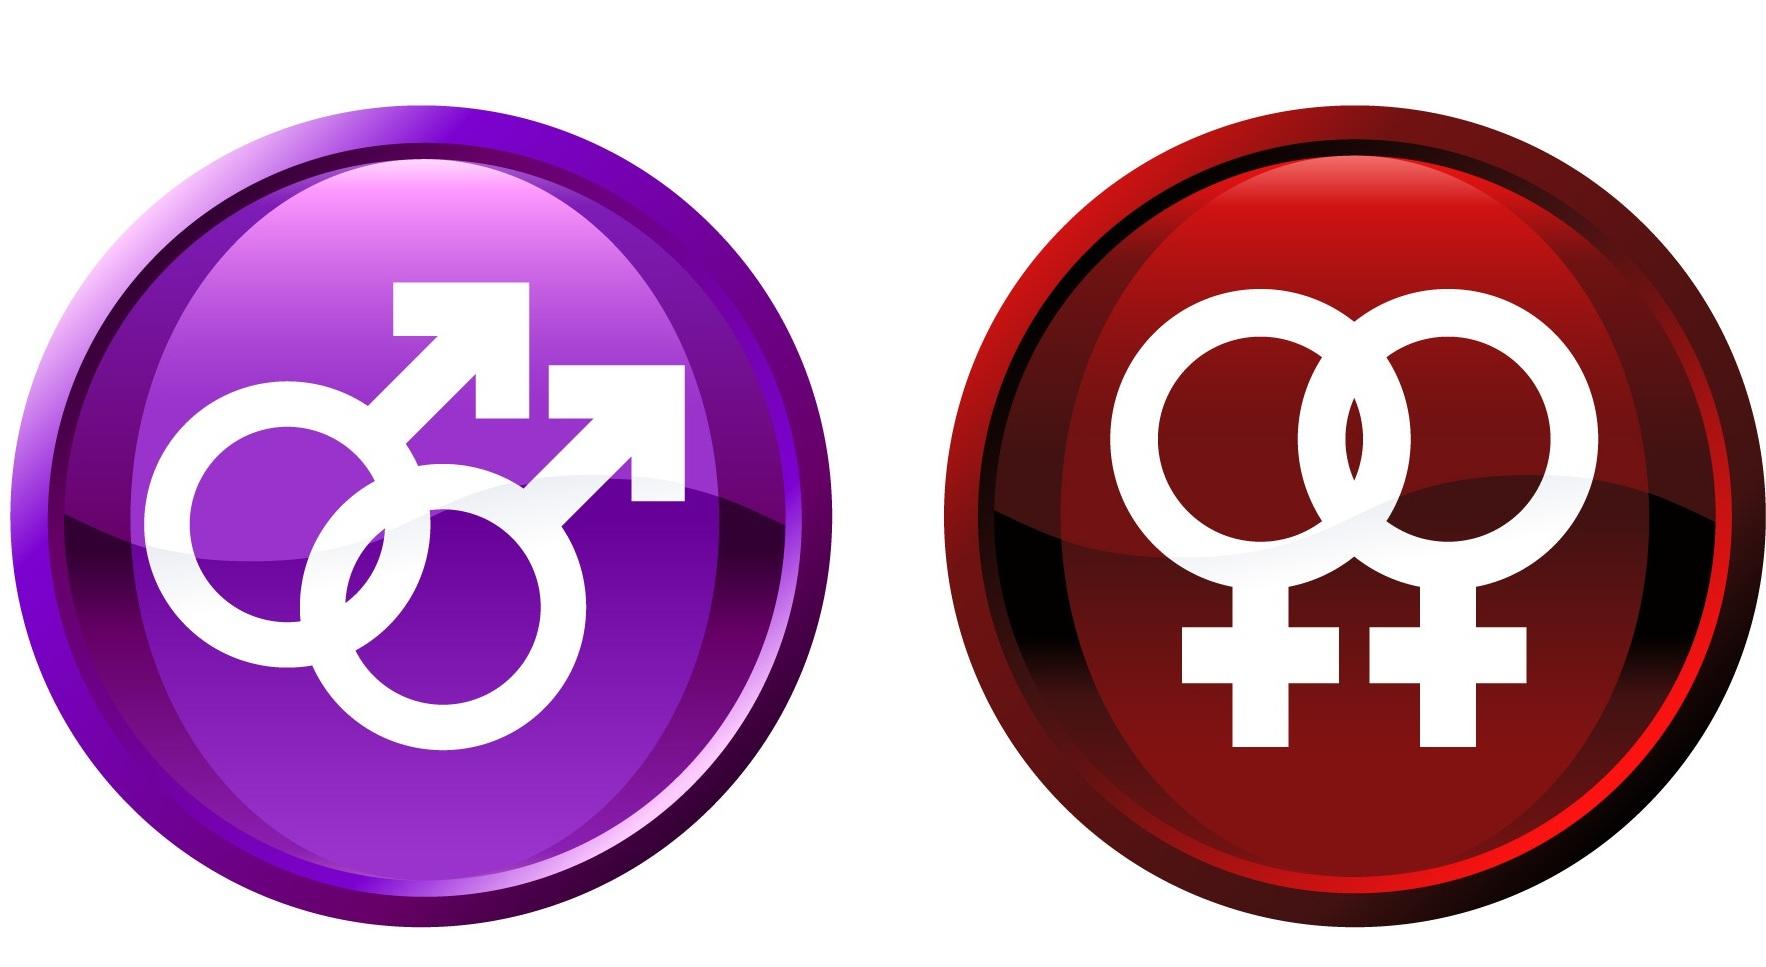 lesbicas a fazer sexo chat portugal gay